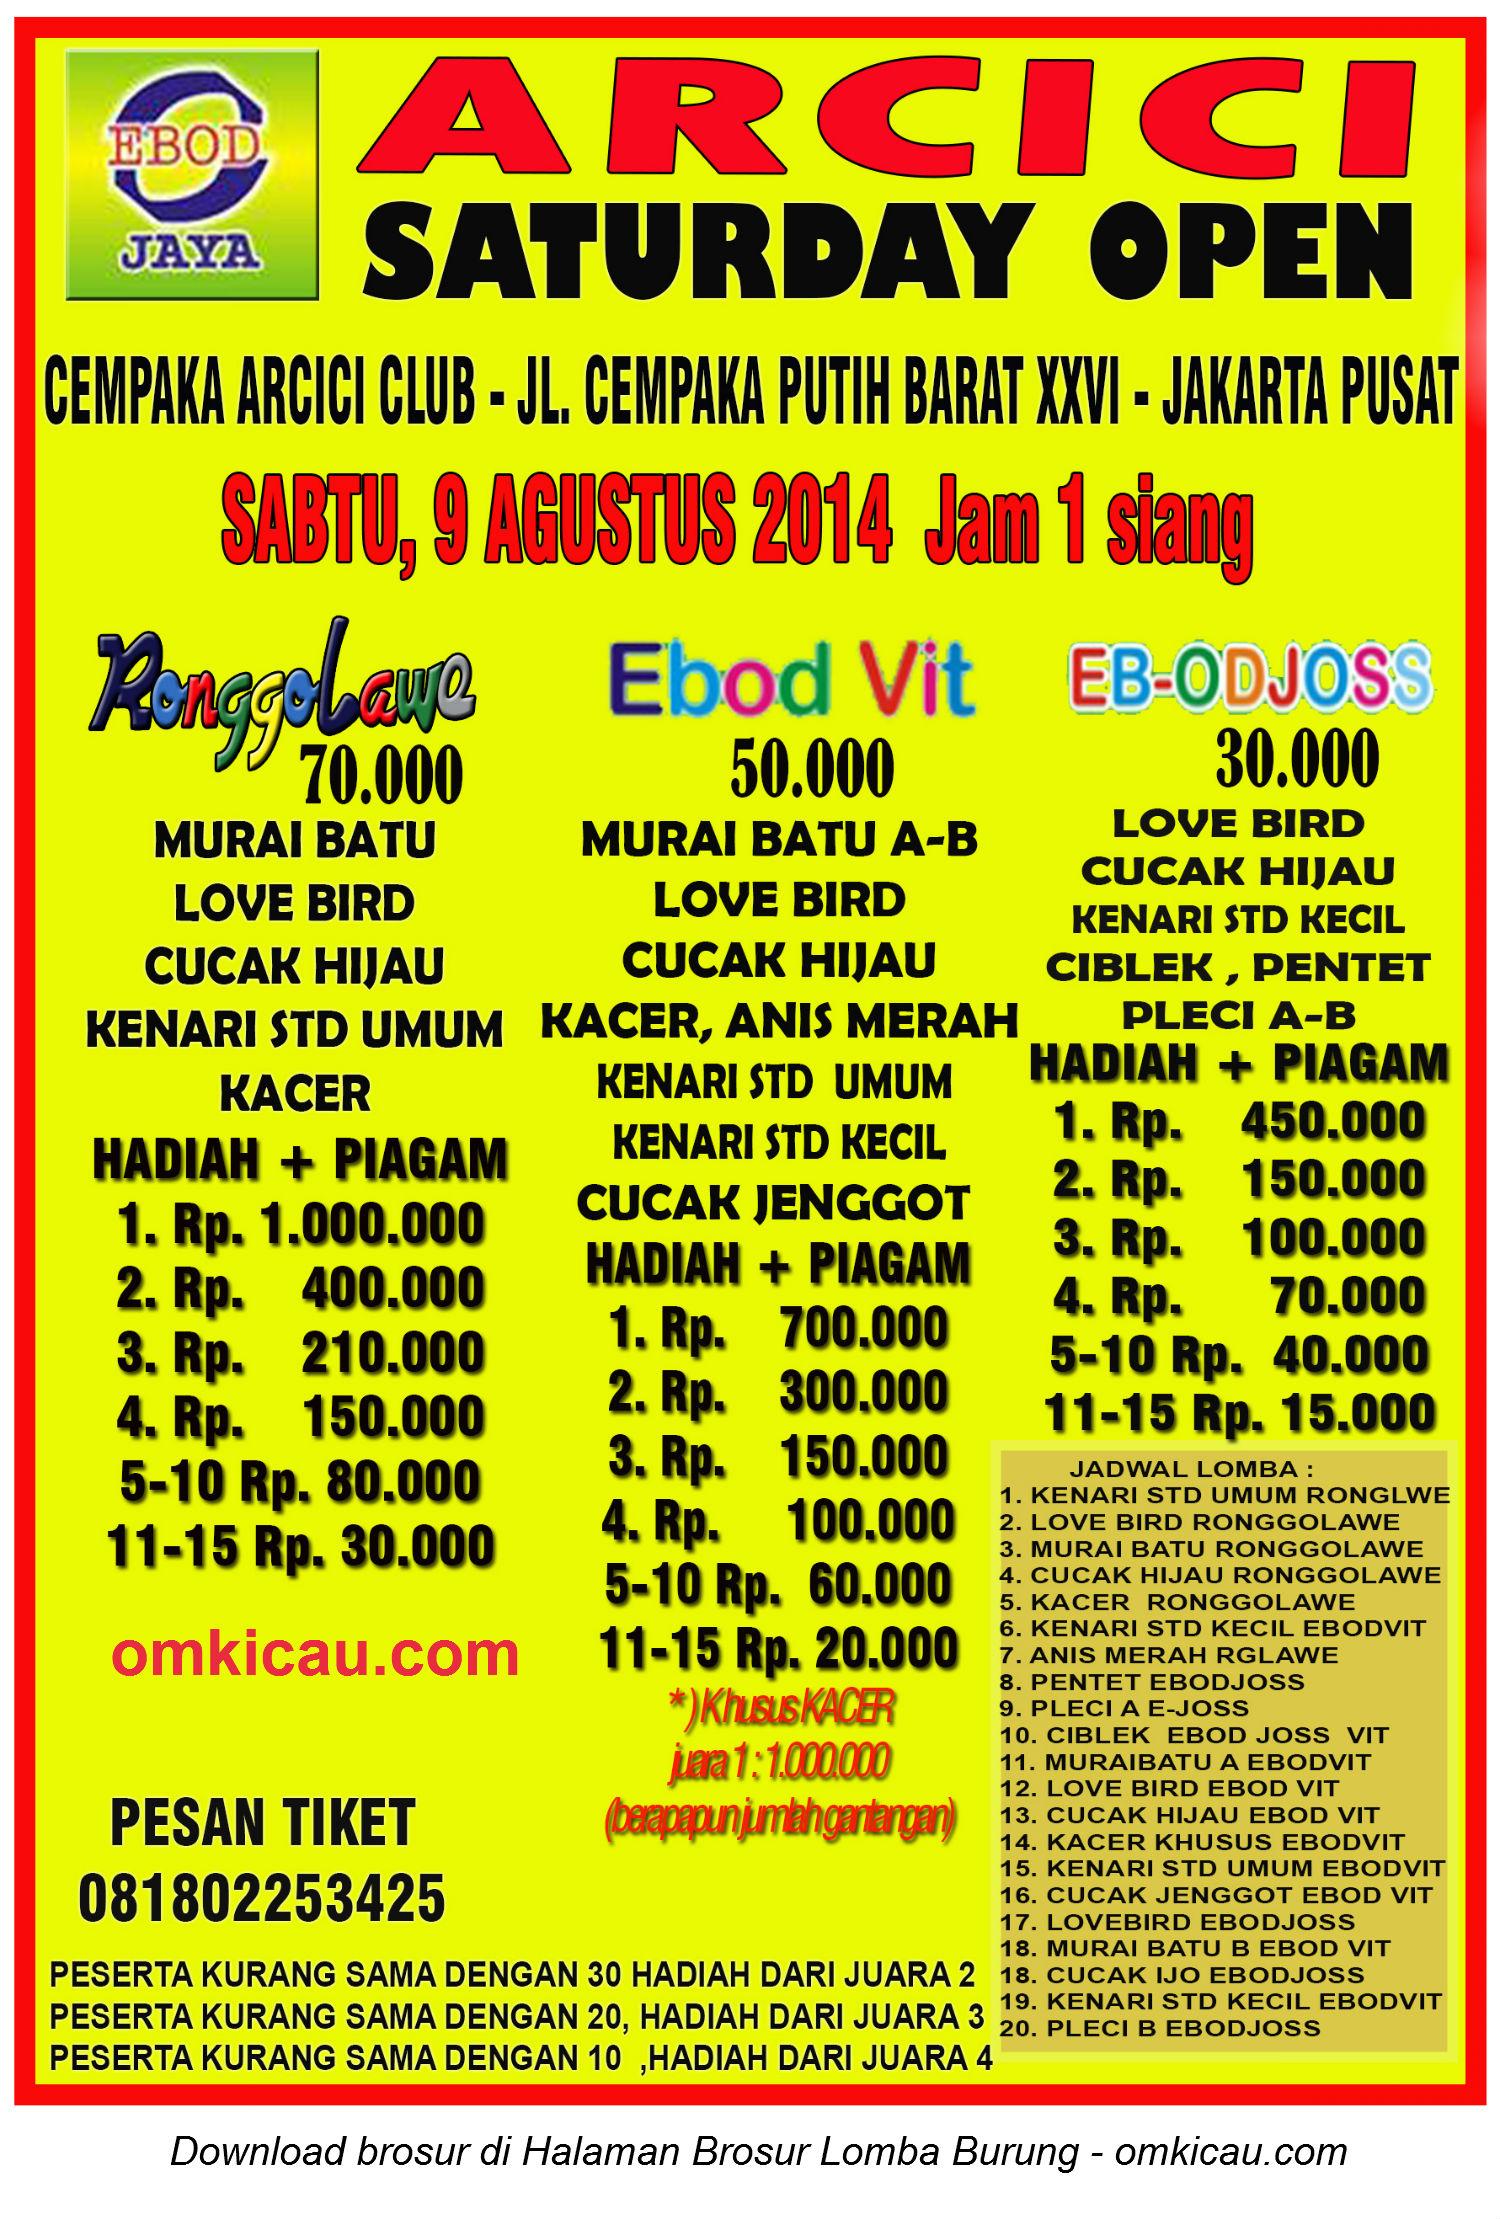 Brosur Latpres Arcici Saturday Open, Jakarta Pusat, 9 Agustus 2014